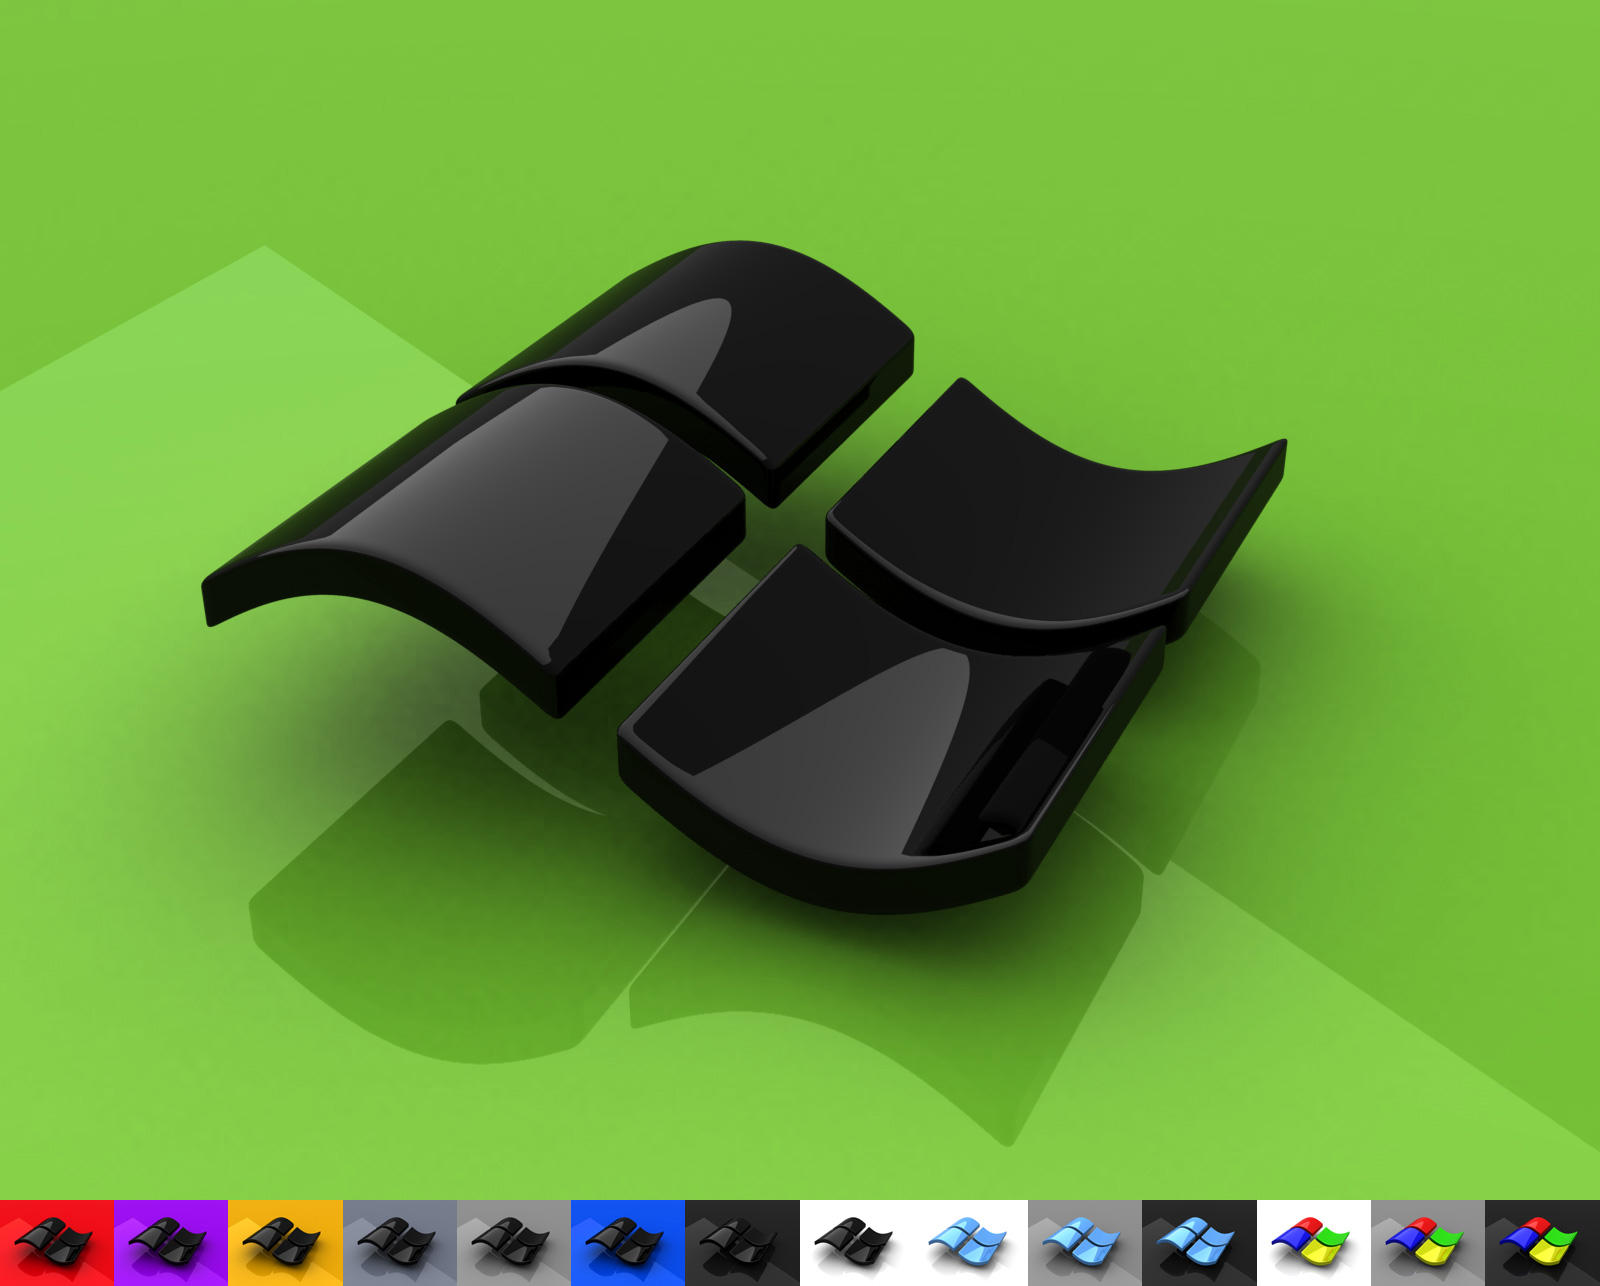 XP Gloss 1600x1200 by rpeterclark